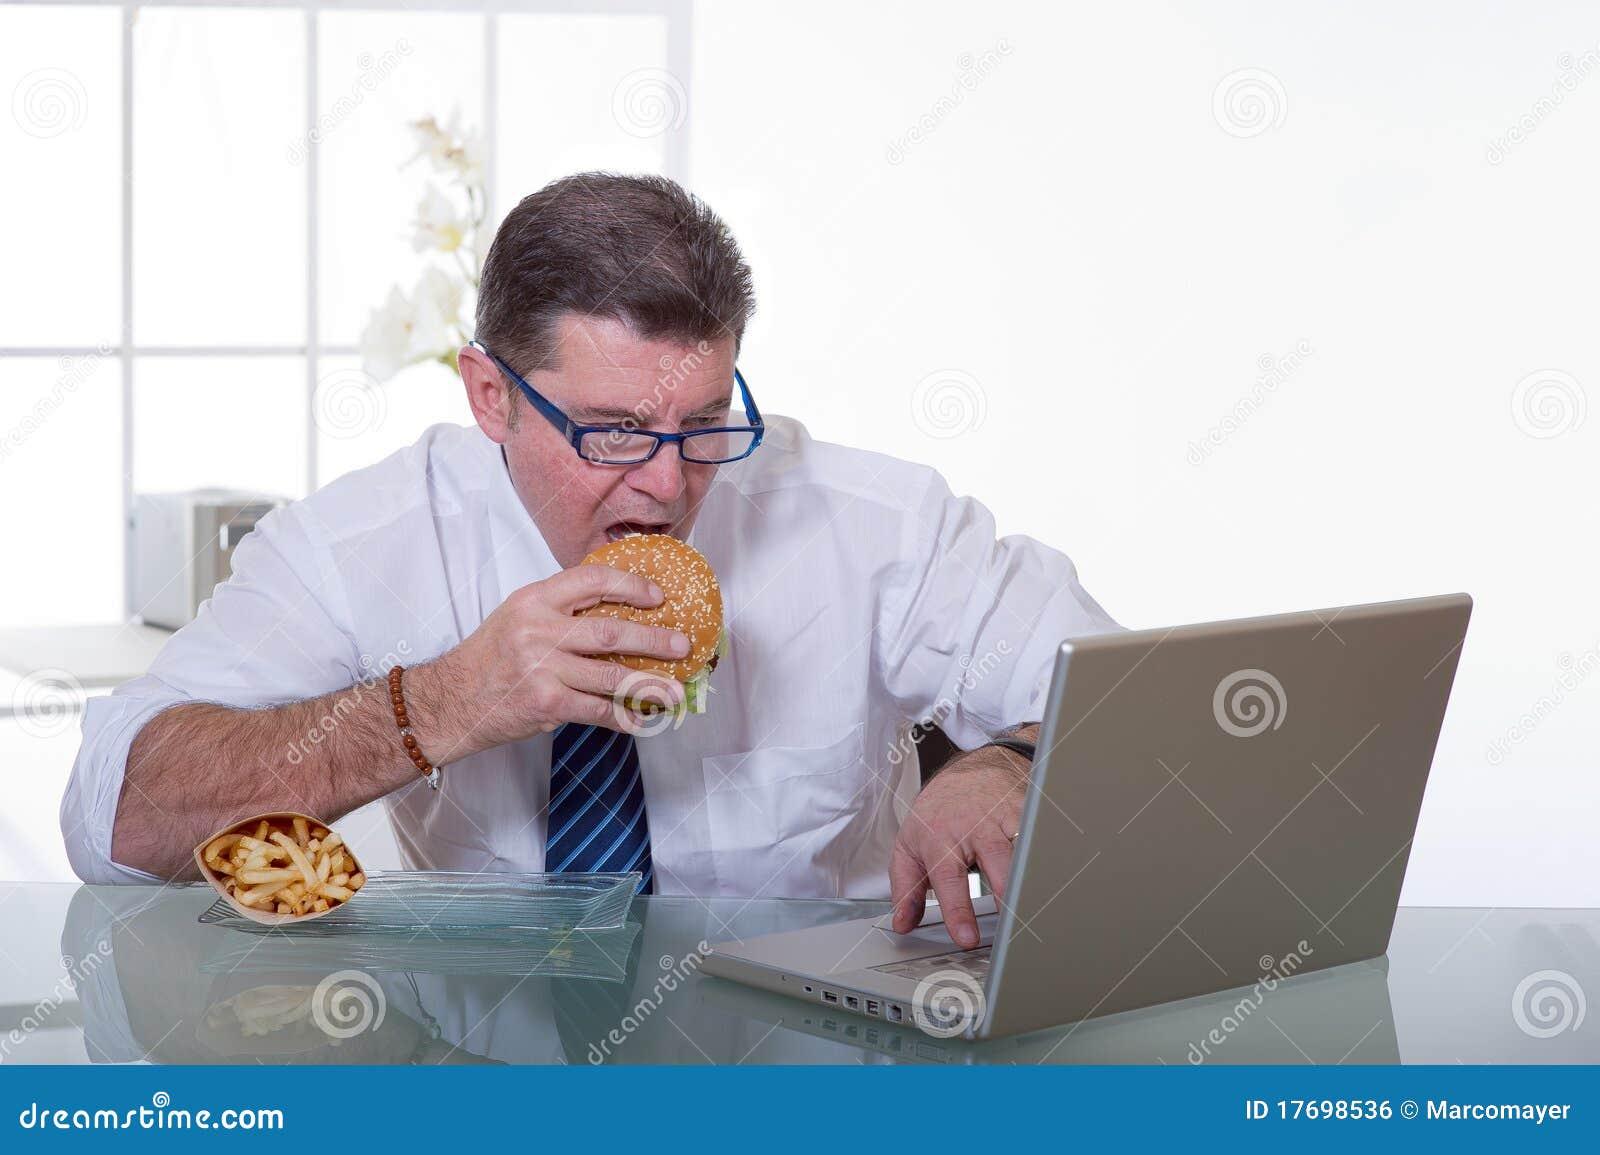 Man working and eat unhealt food